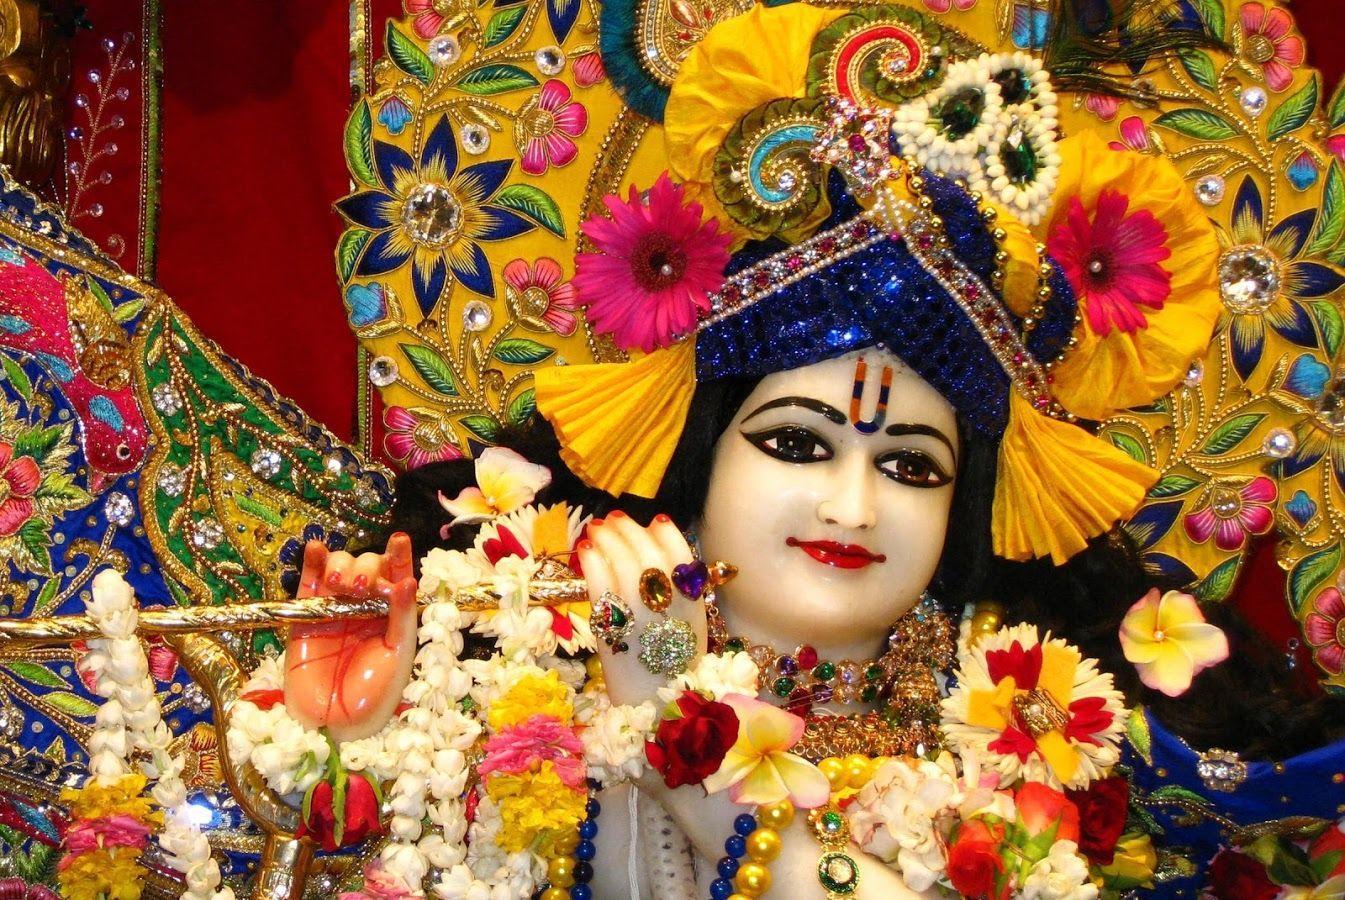 Shri Krishna Wallpapers Wallpaper Cave